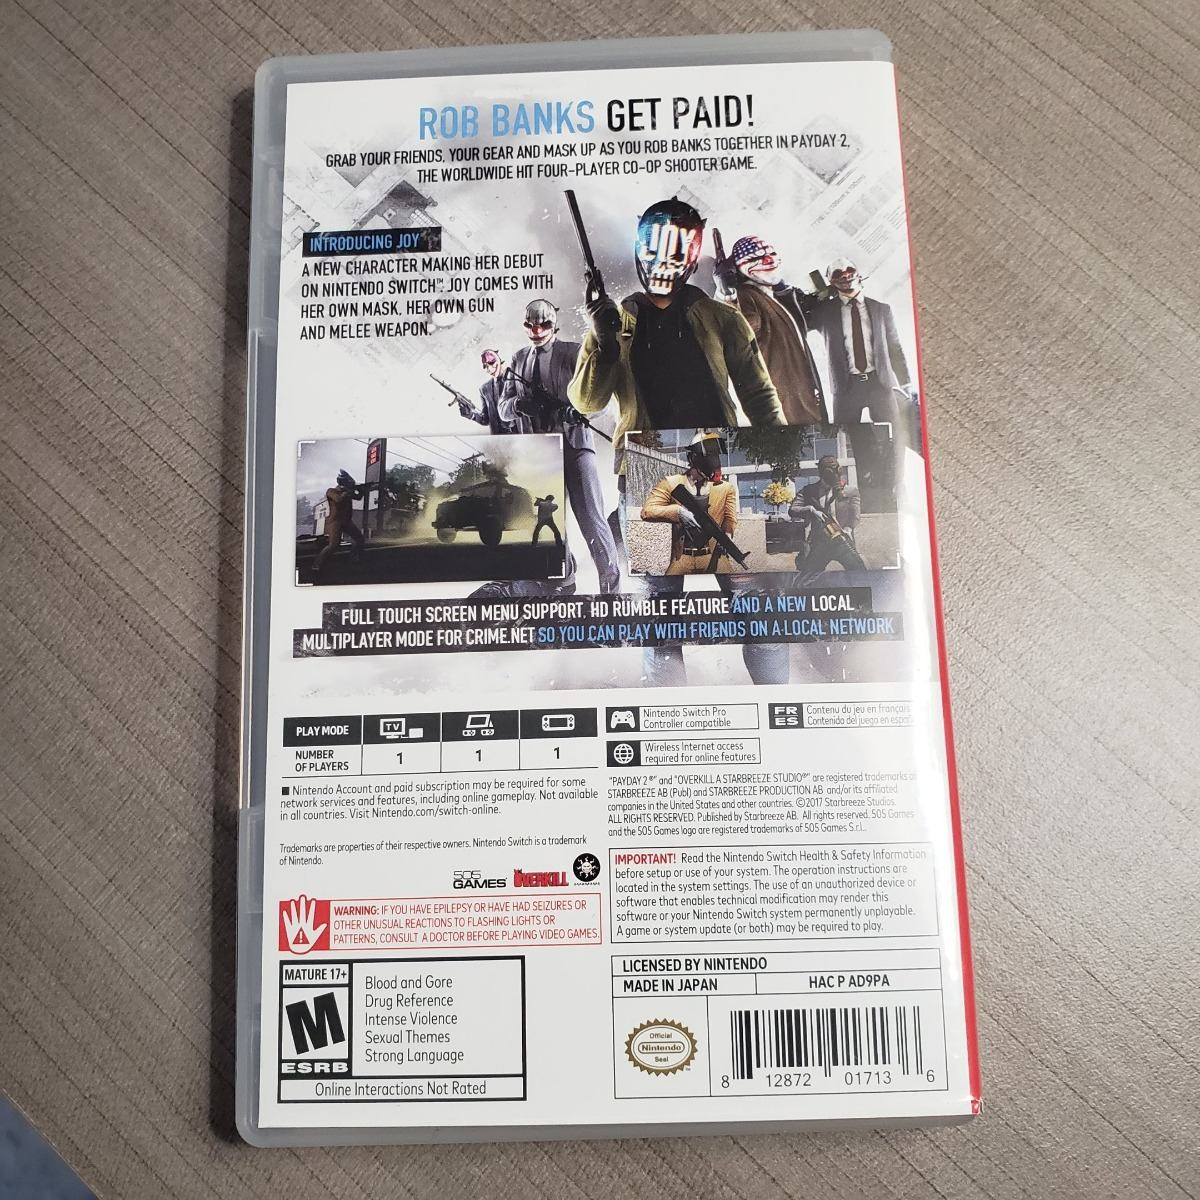 Juego Para Consola Nintendo Switch Payday 2 Envio Gratis 899 00